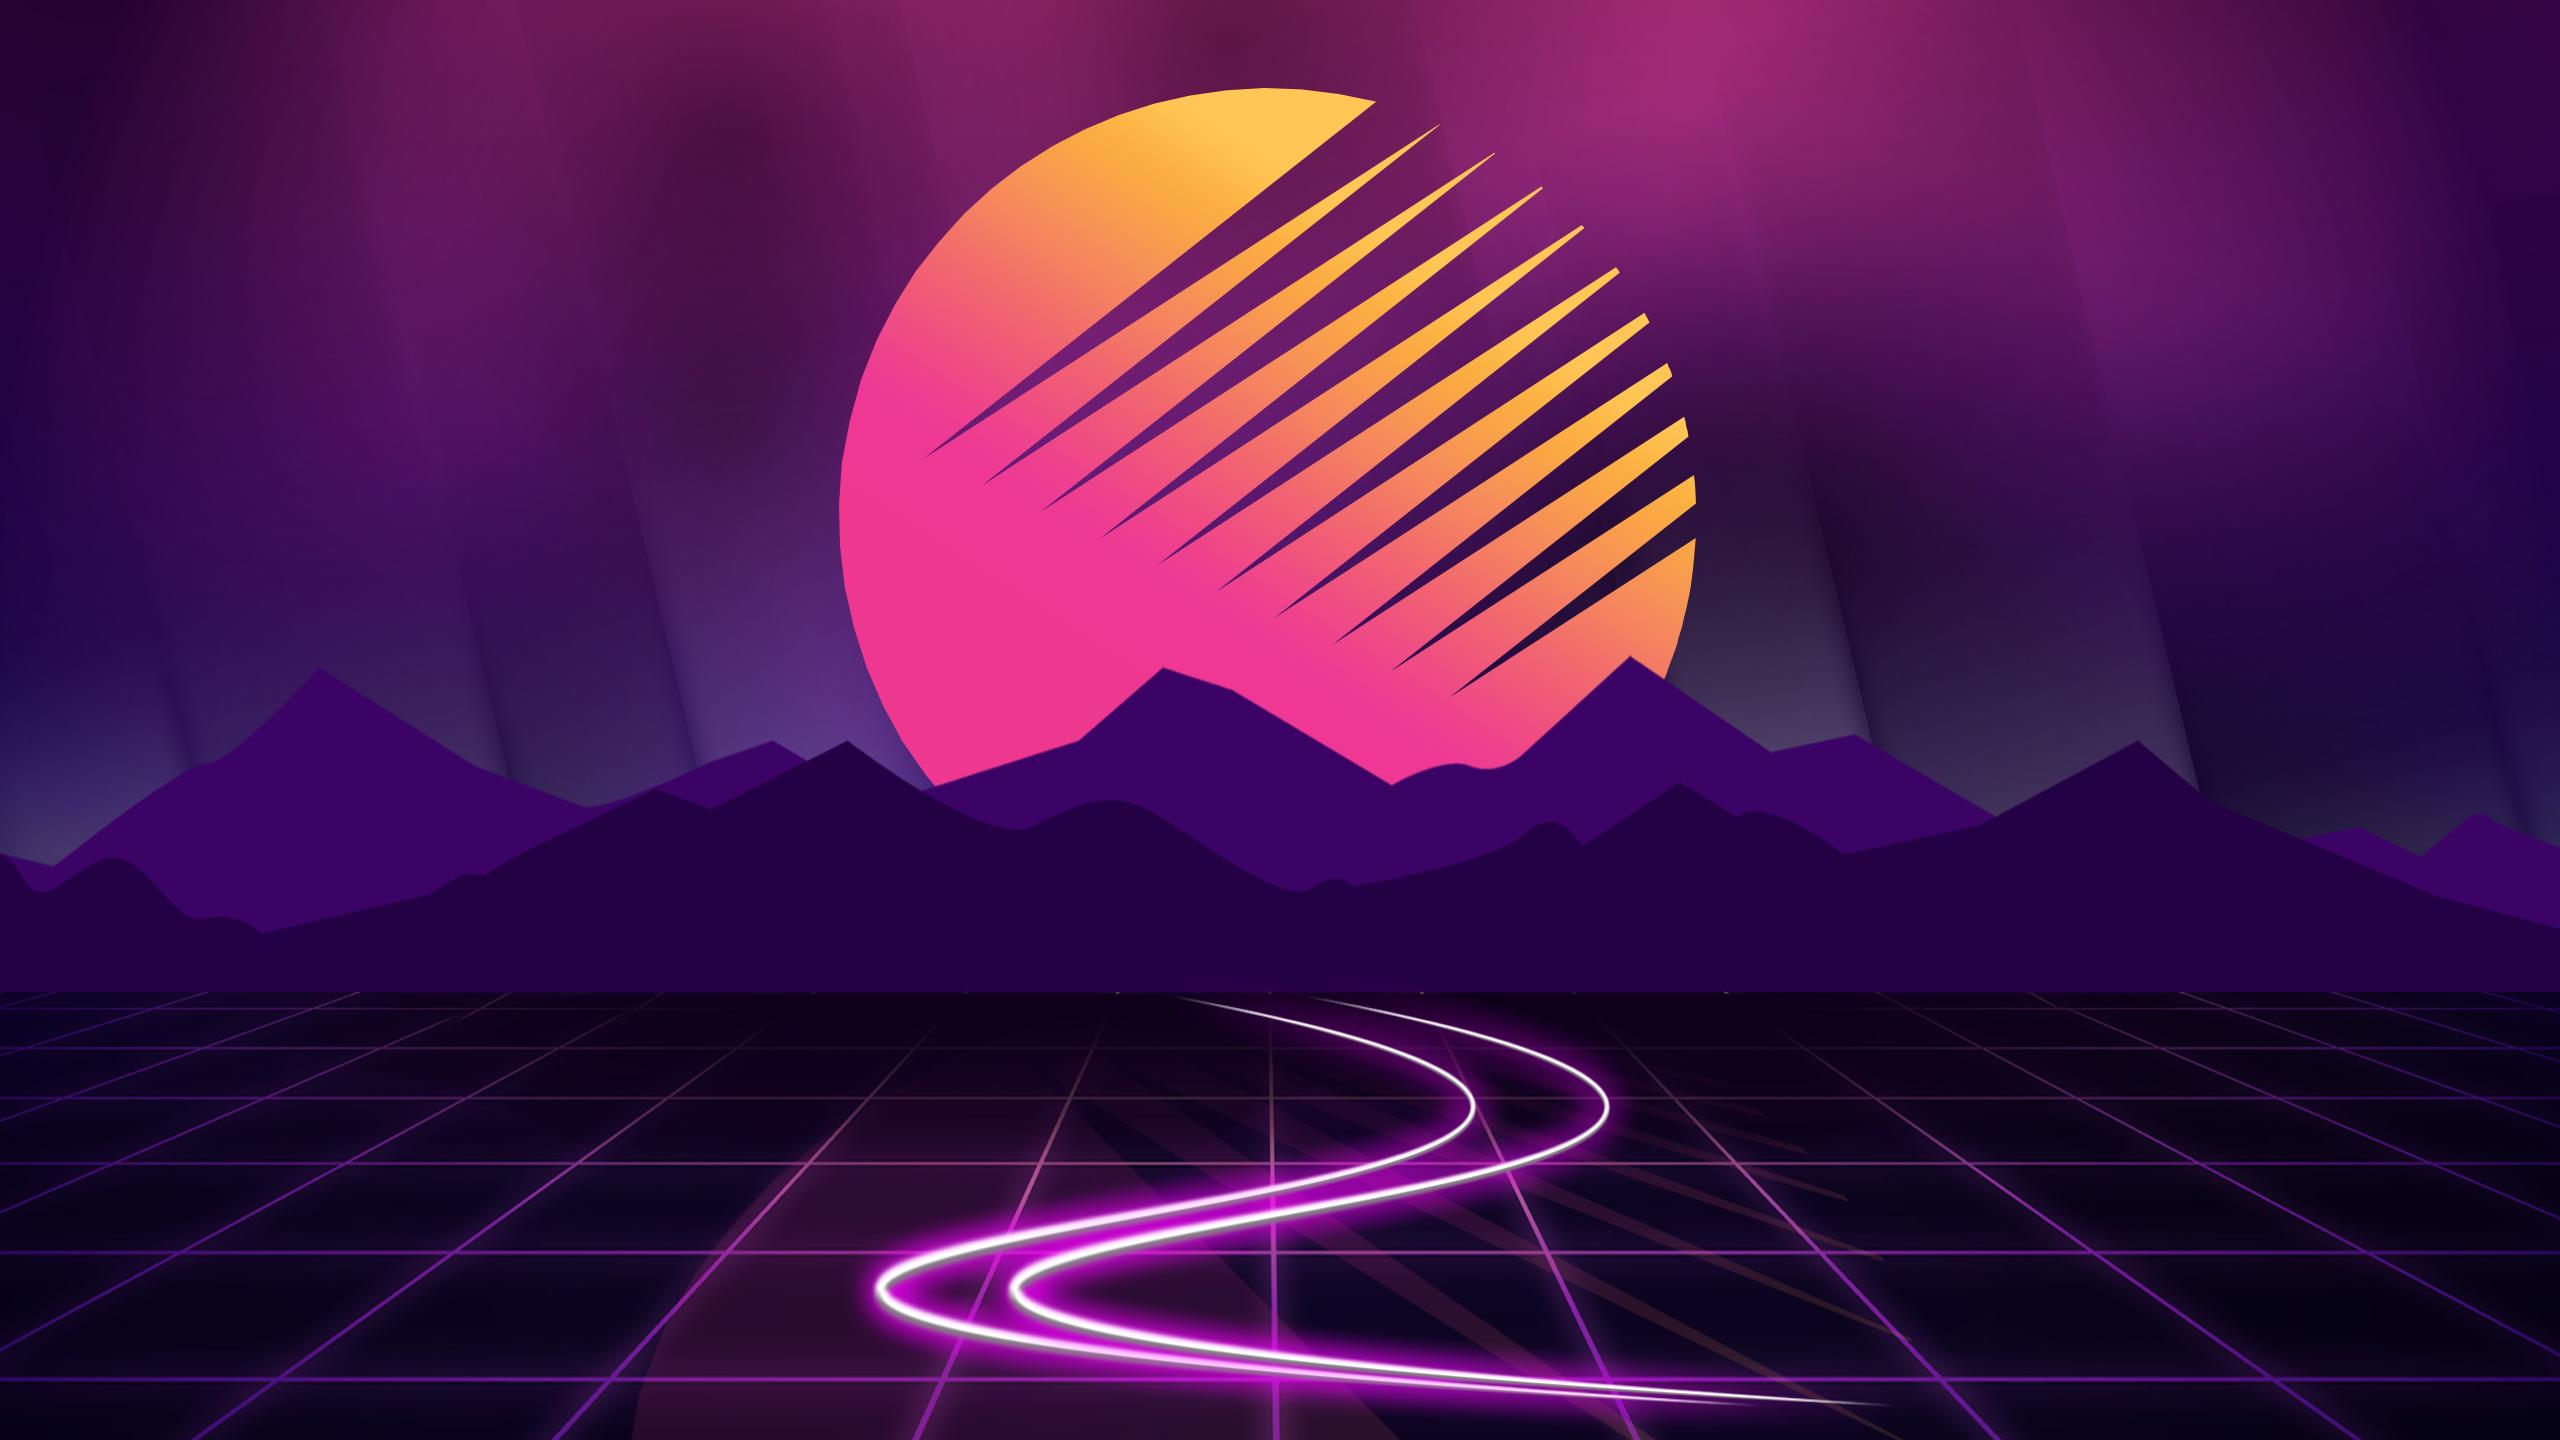 Retrowave Sunset Wallpaper HD Artist 4K Wallpapers Images